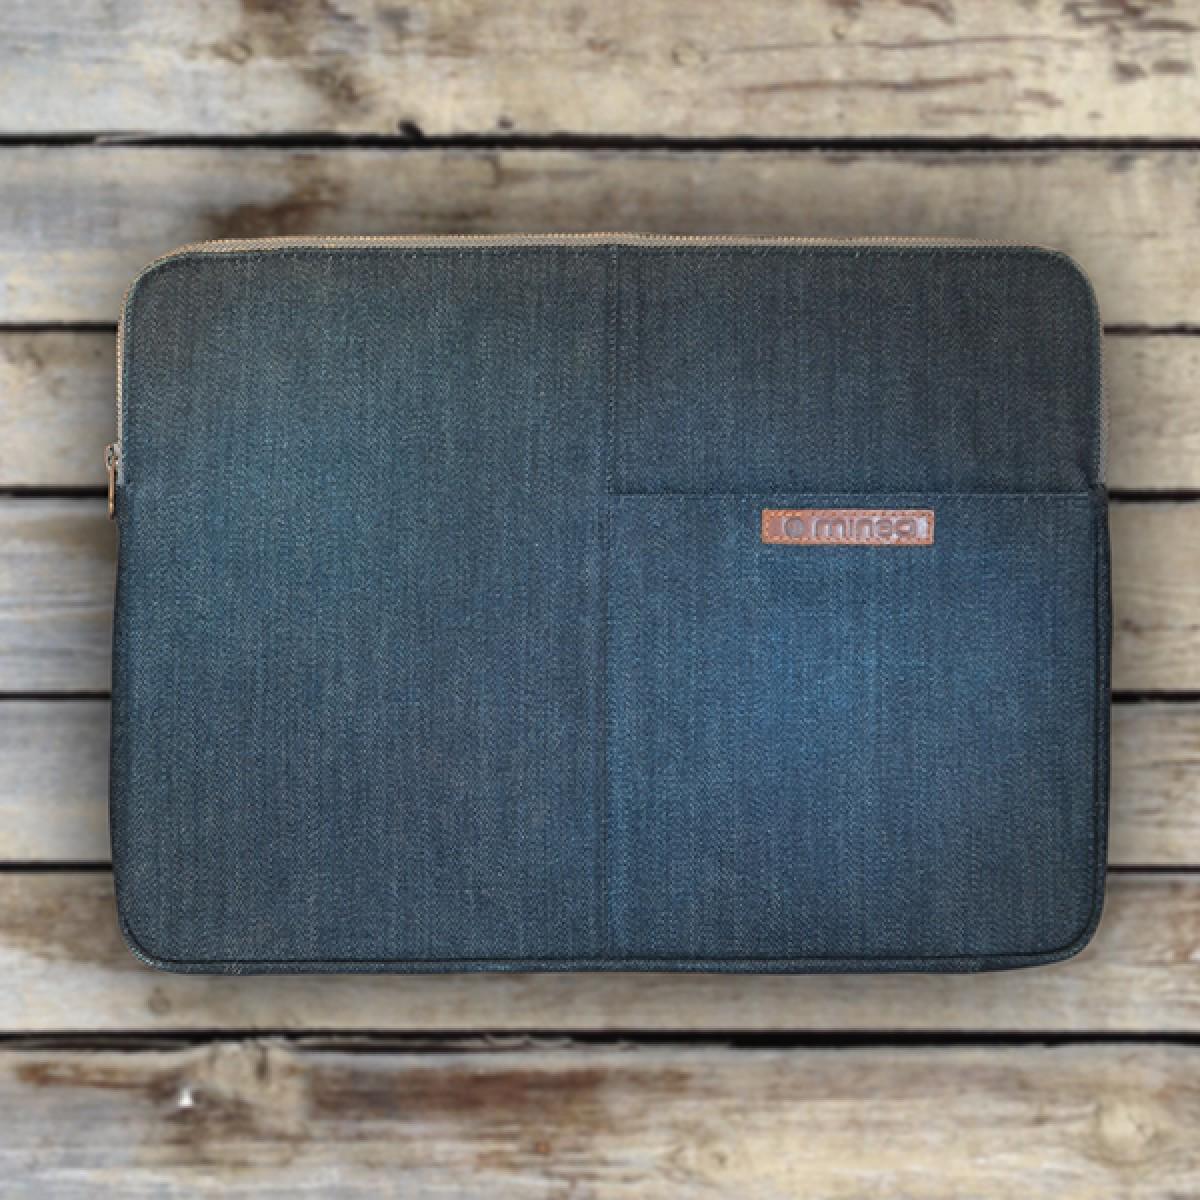 mineD FLUSH - Laptoptasche aus Jeans